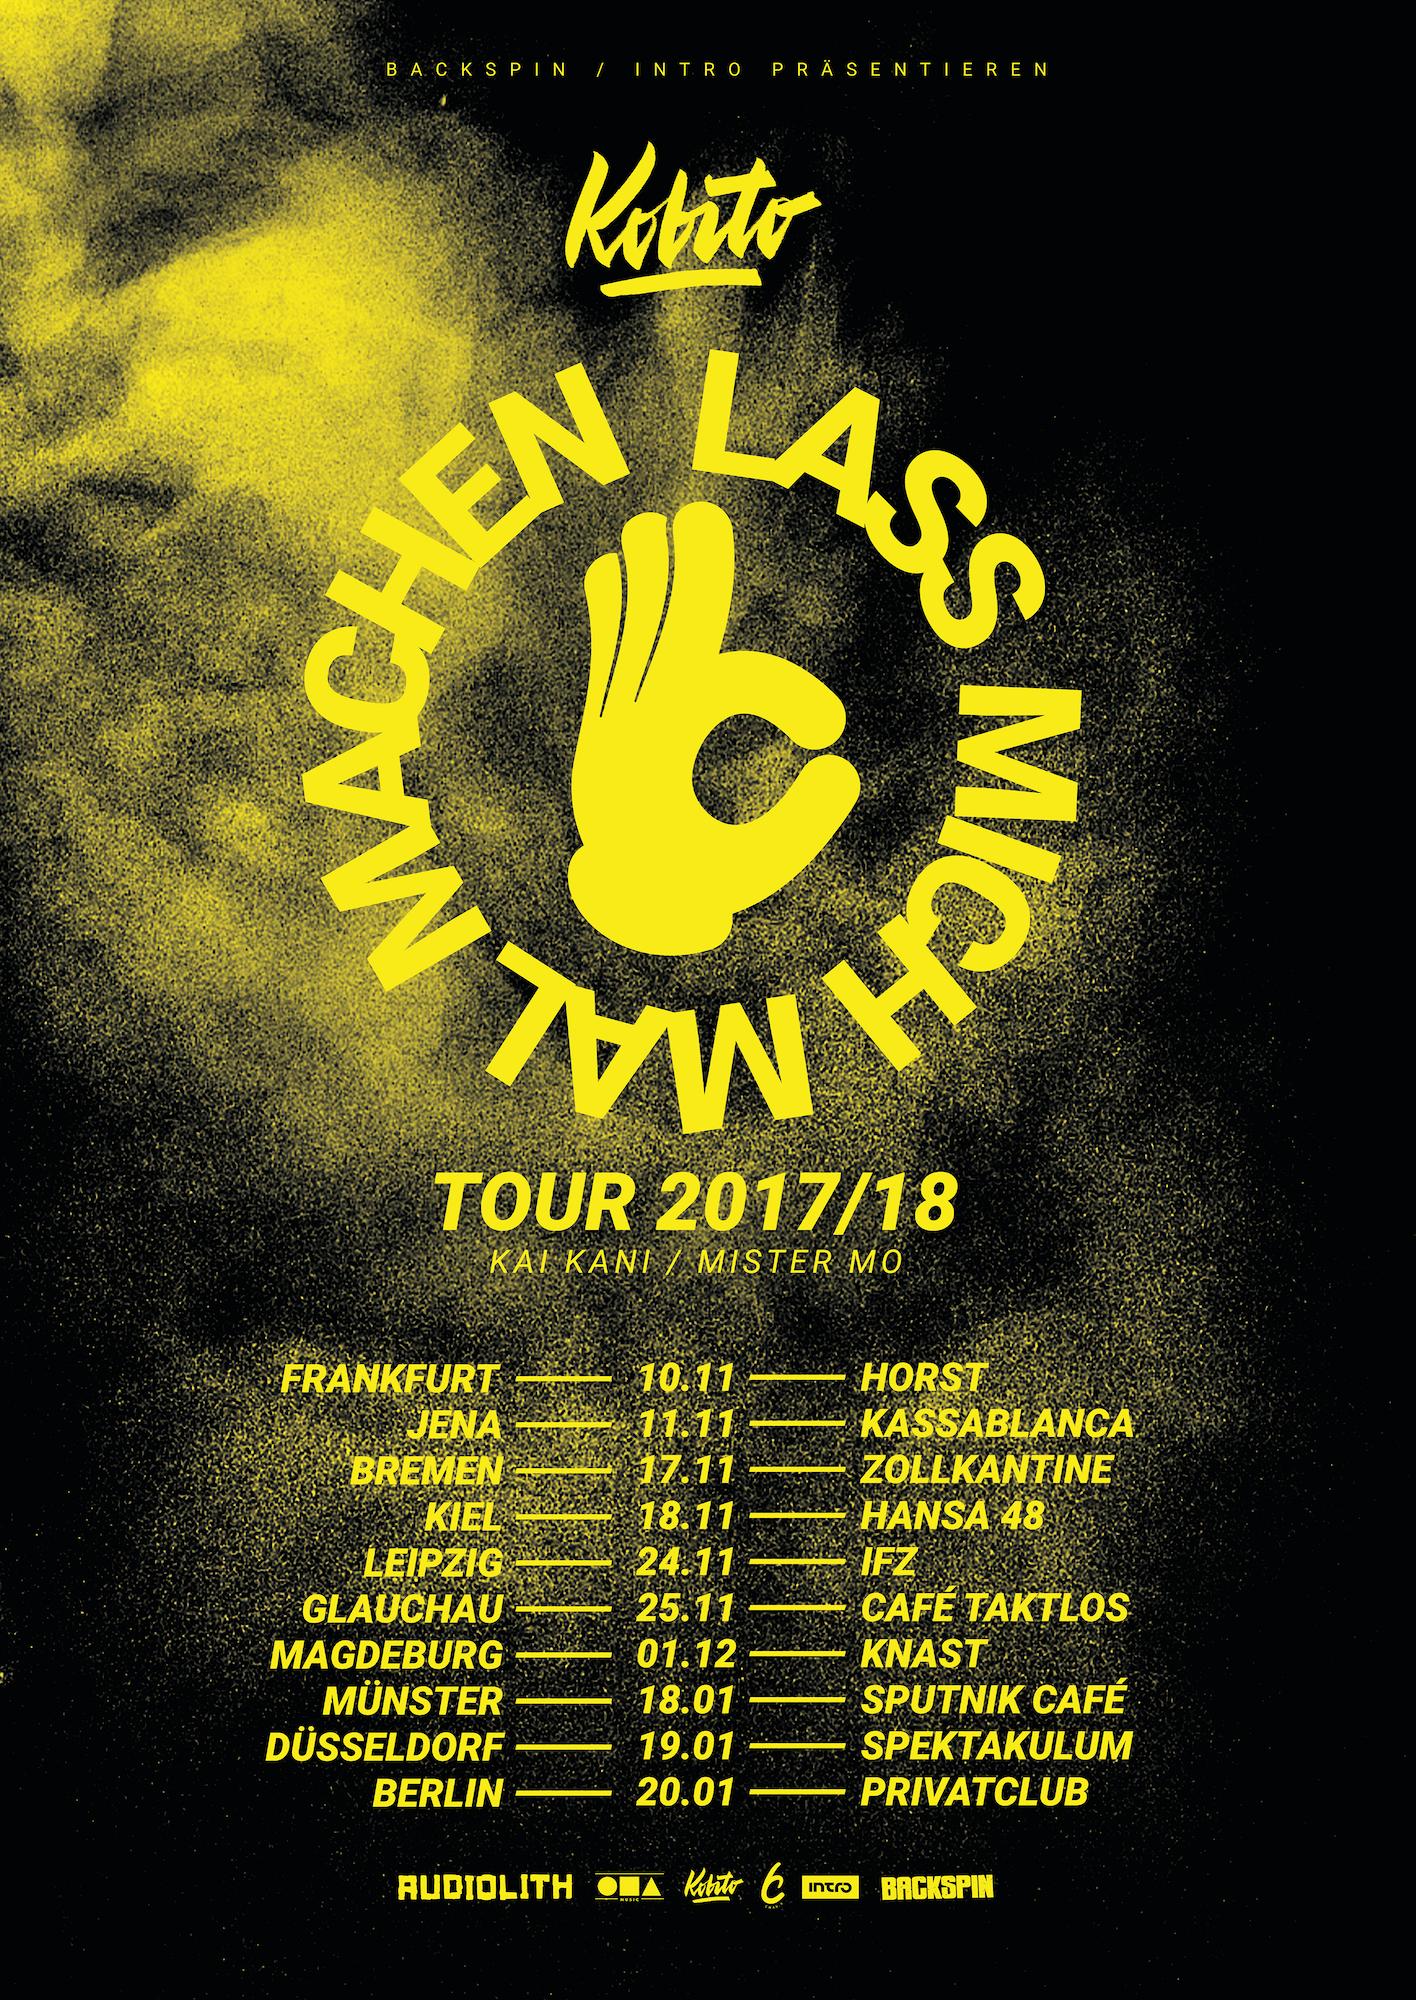 Tourplakat_Kobito_Lass Mich Mal Machen-online